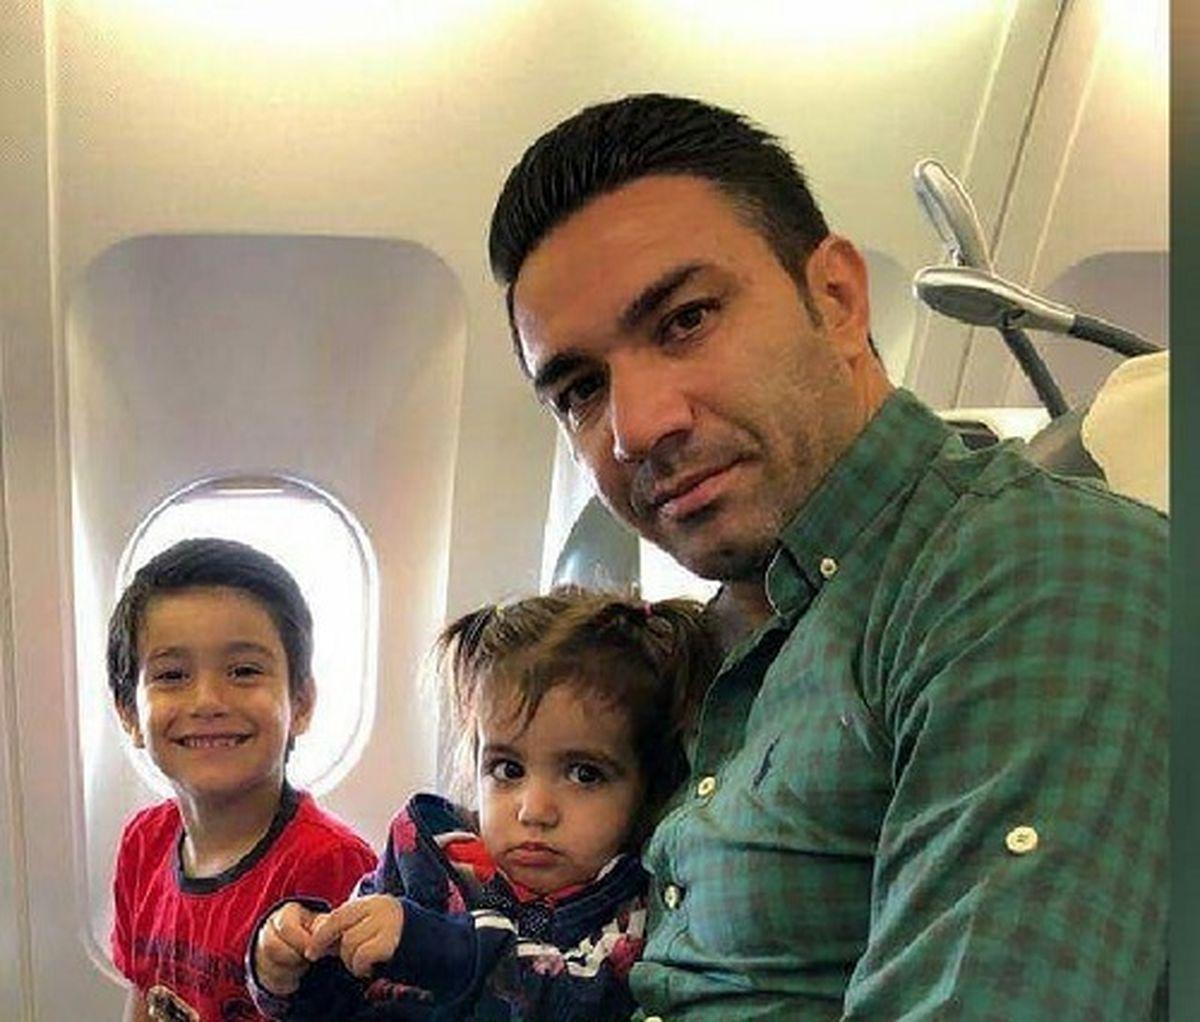 جشن تولد فوتبالی پسر جواد نکونام + تصاویر